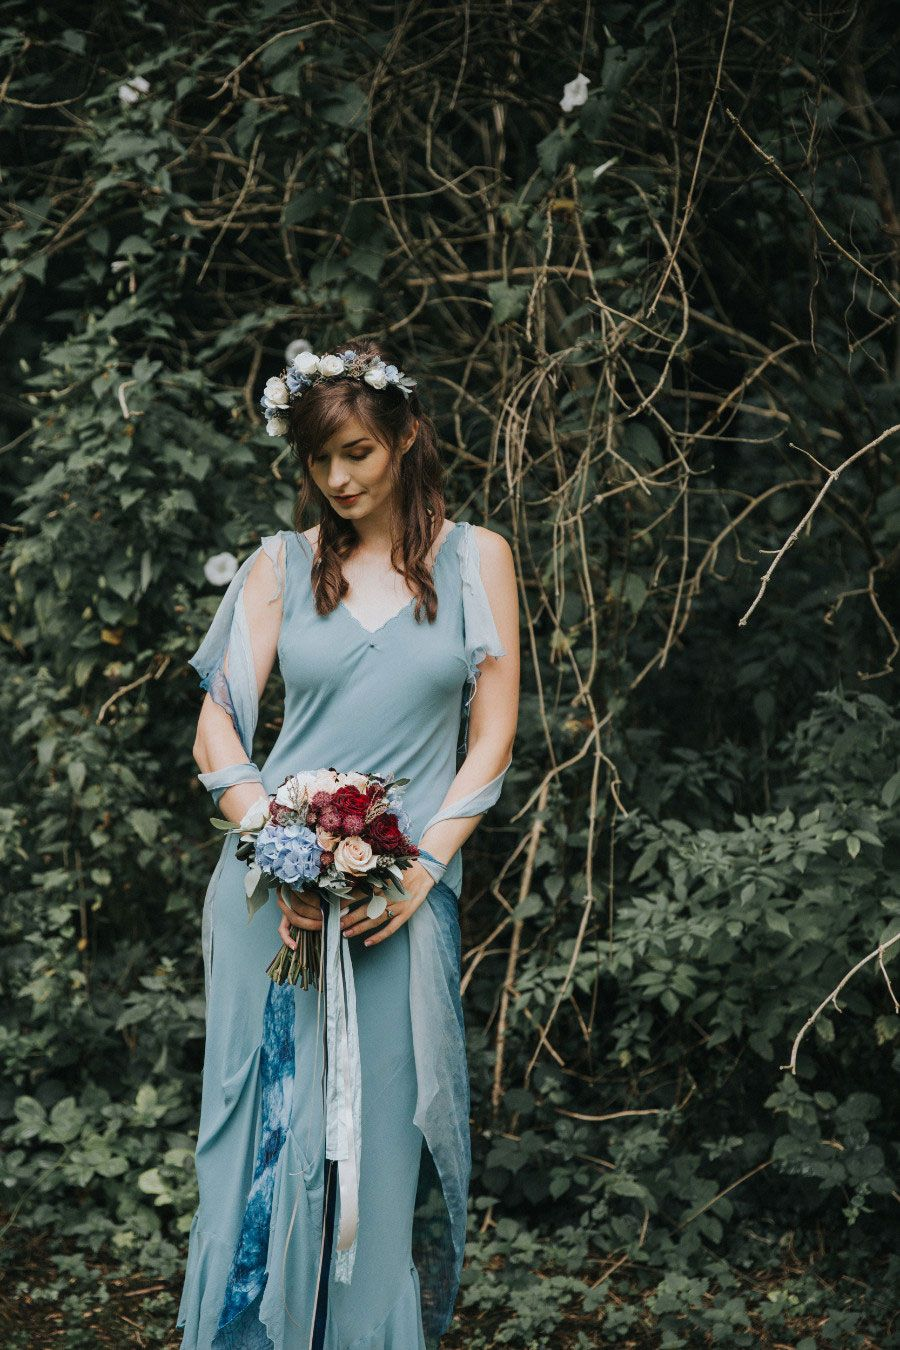 Alice in wonderland themed wedding dress  A Winter Themed Alice in Wonderland Bridal Shoot With Pale Blue